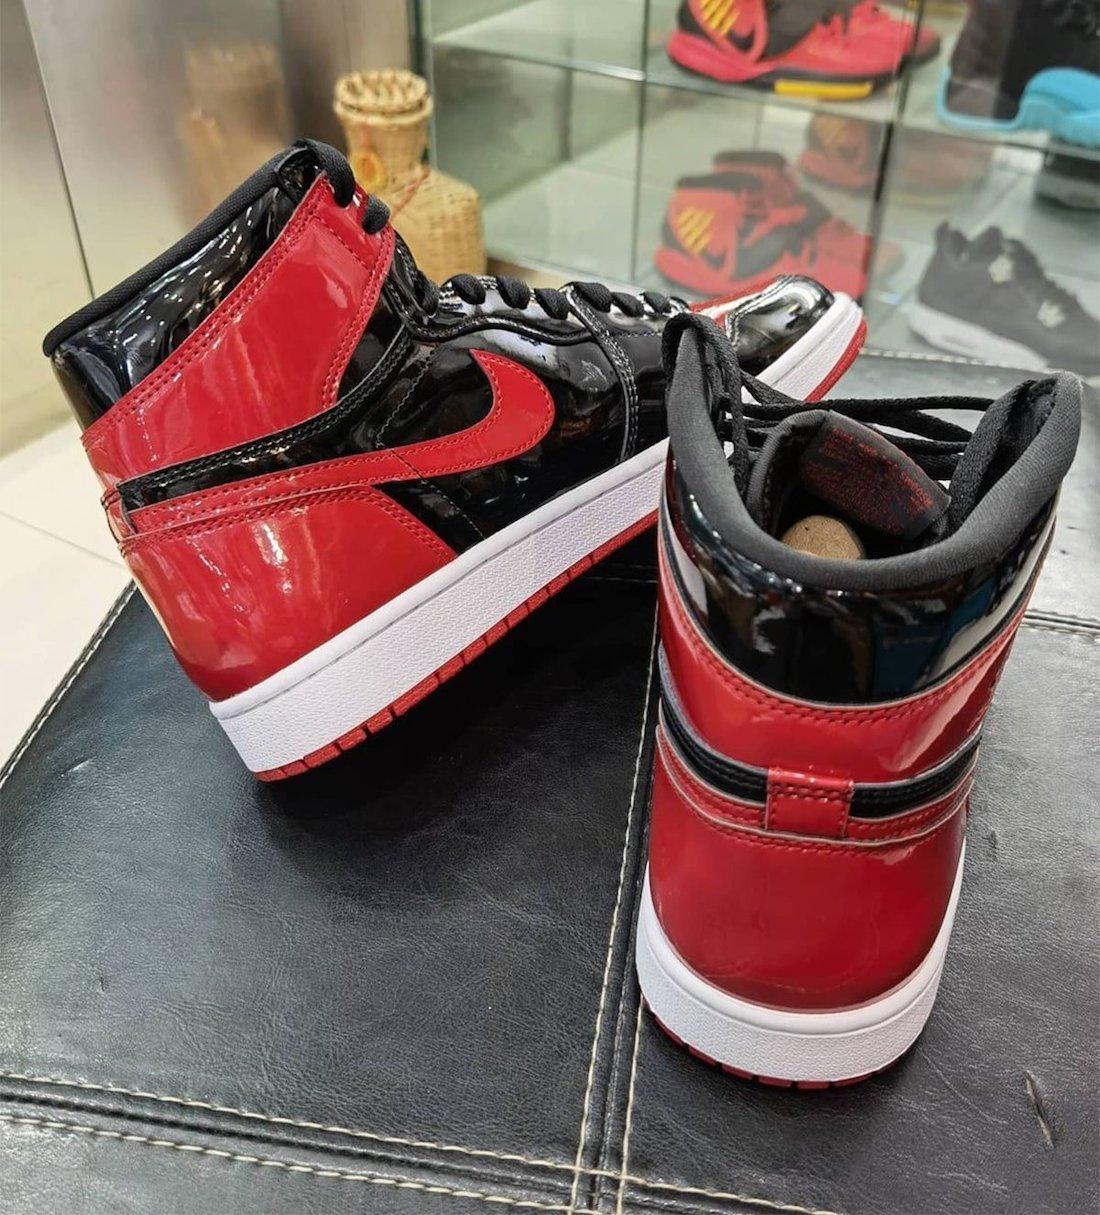 Air Jordan 1 High OG Bred Patent 555088-063 Release Date